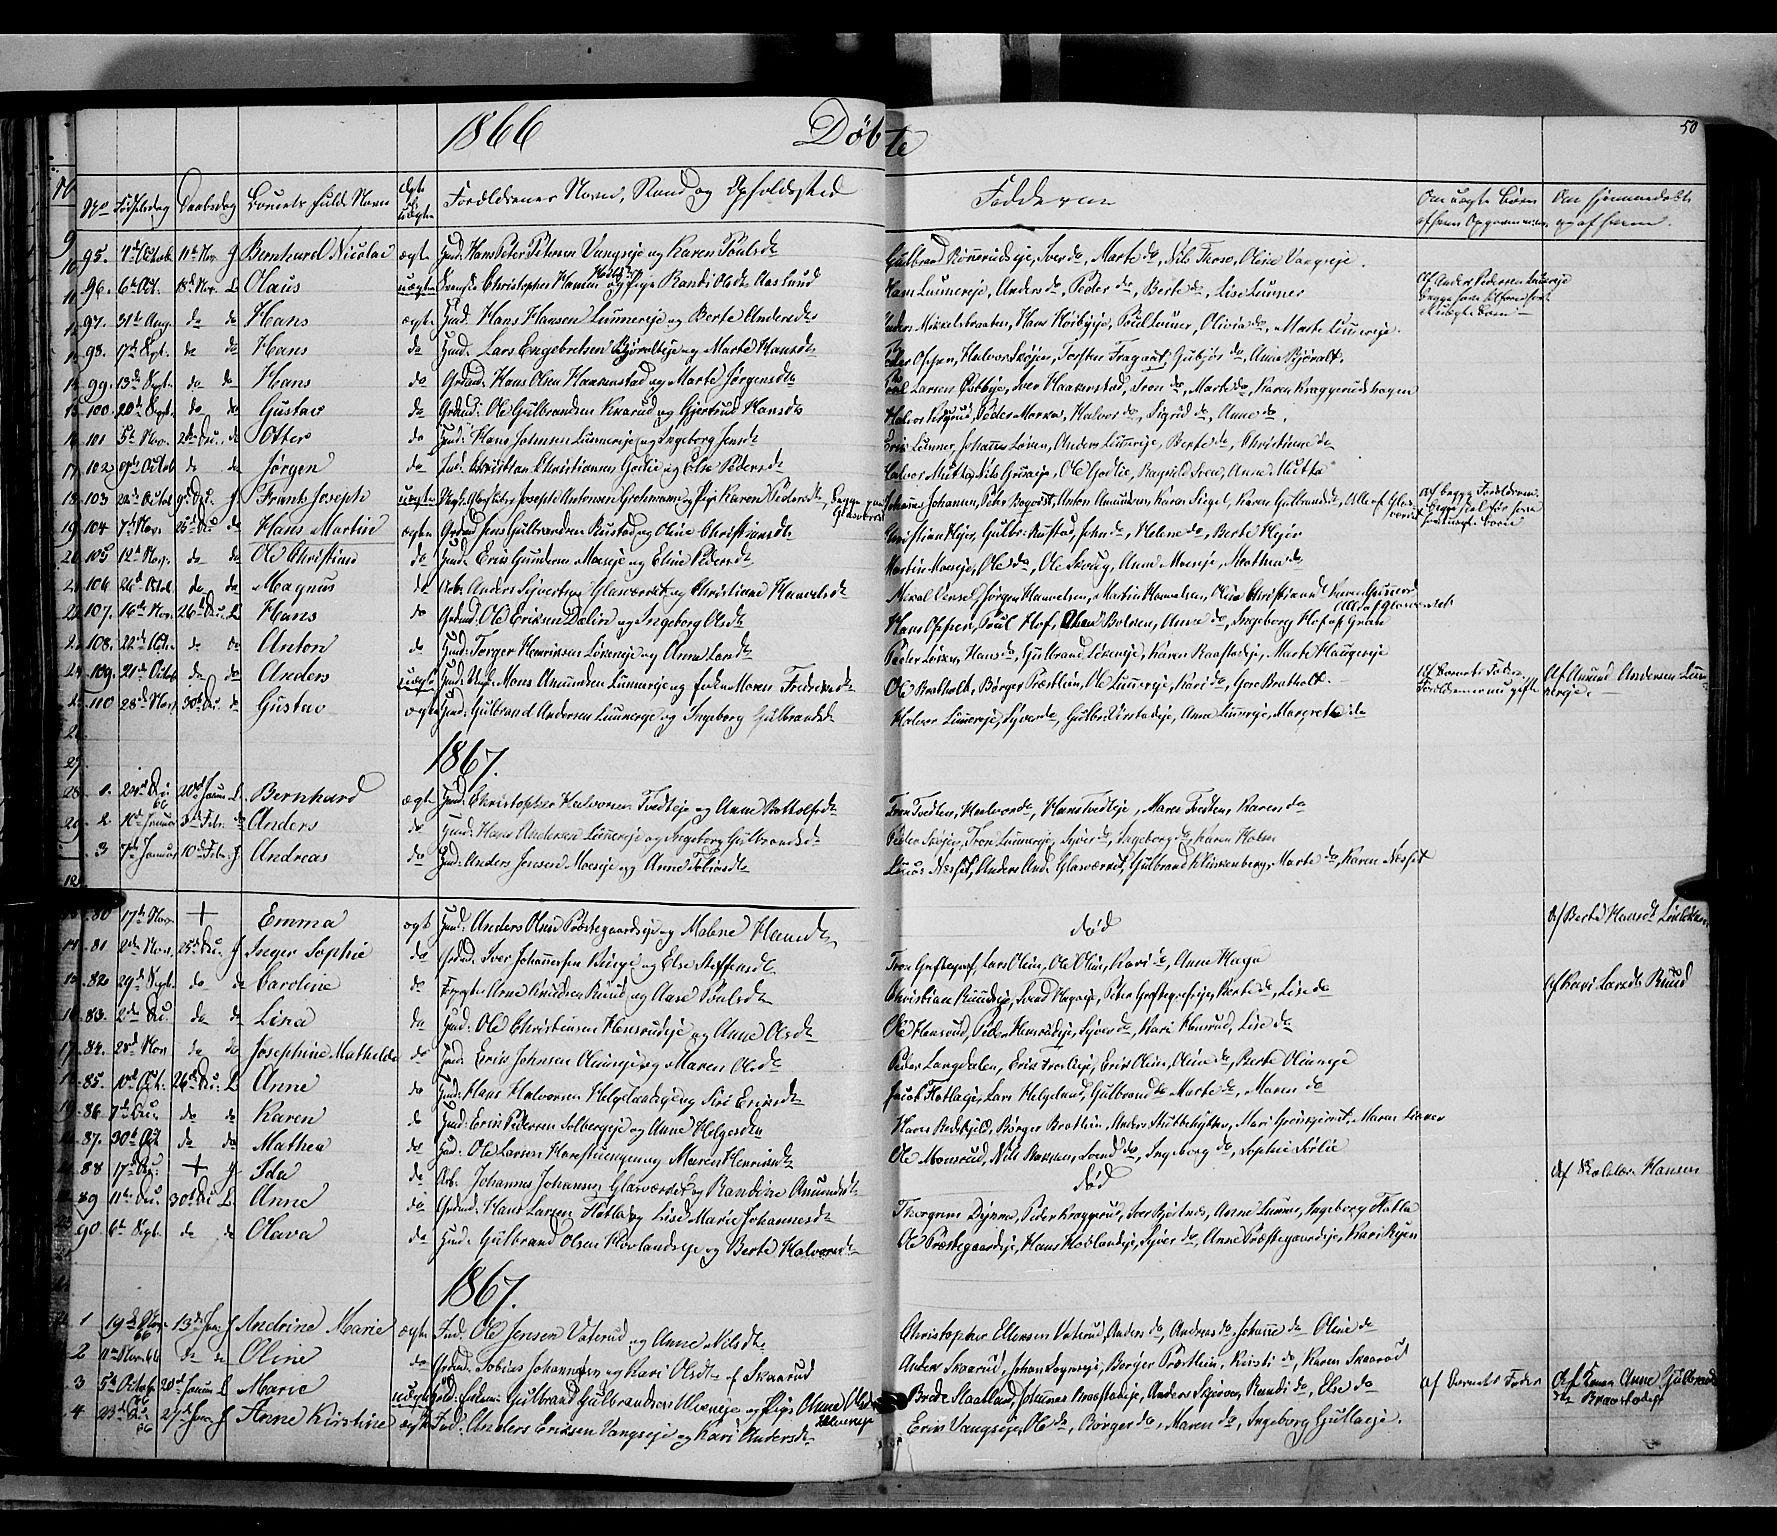 SAH, Jevnaker prestekontor, Ministerialbok nr. 7, 1858-1876, s. 50